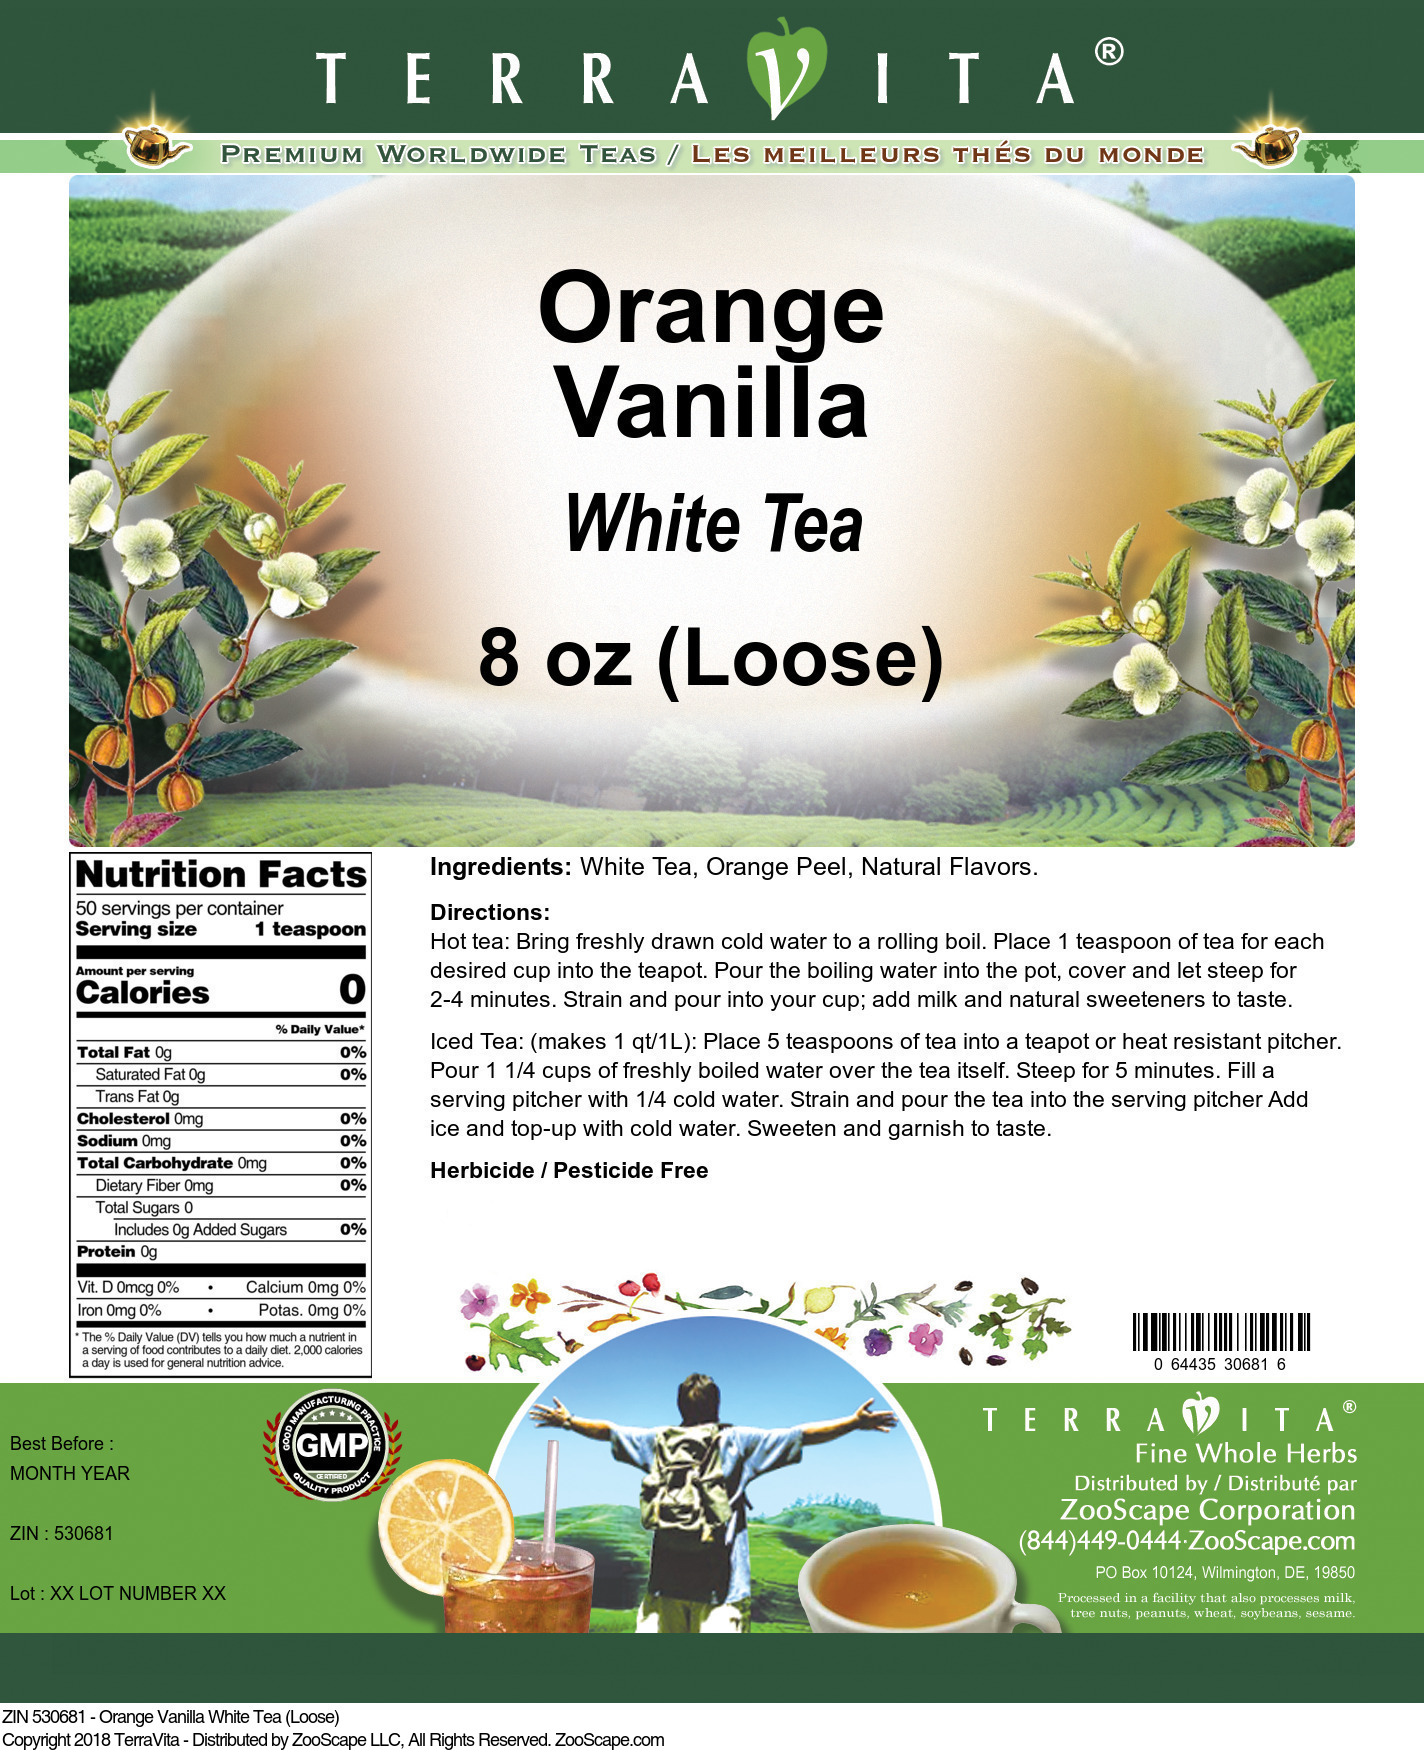 Orange Vanilla White Tea (Loose)